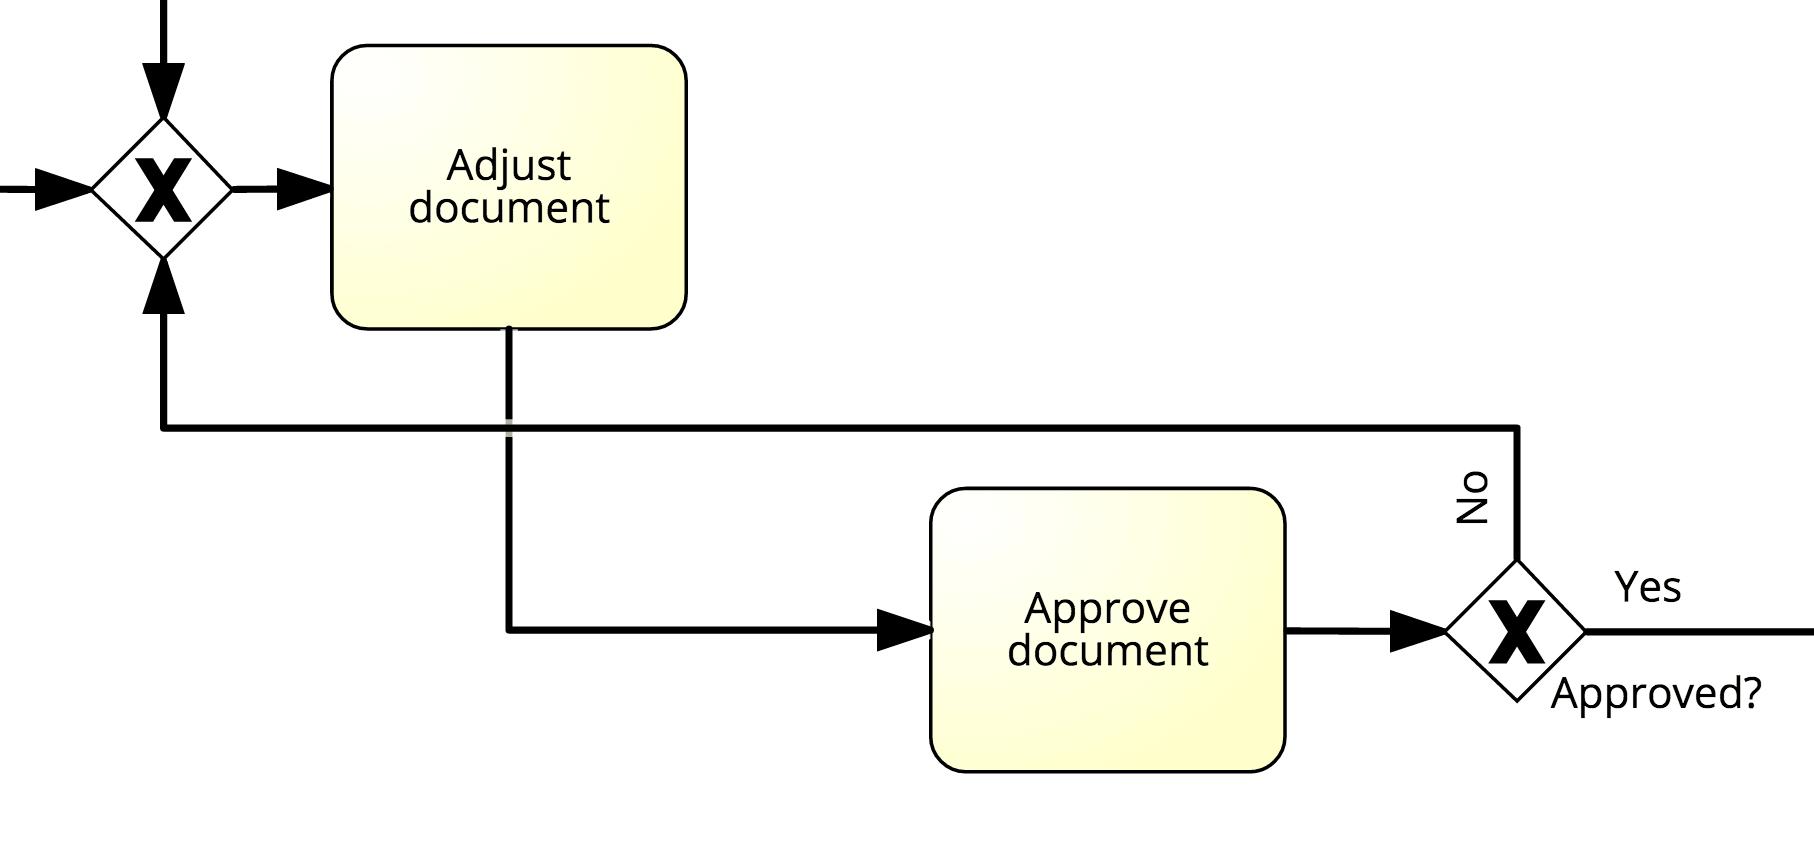 bpmn-modeling-approval-negative-example